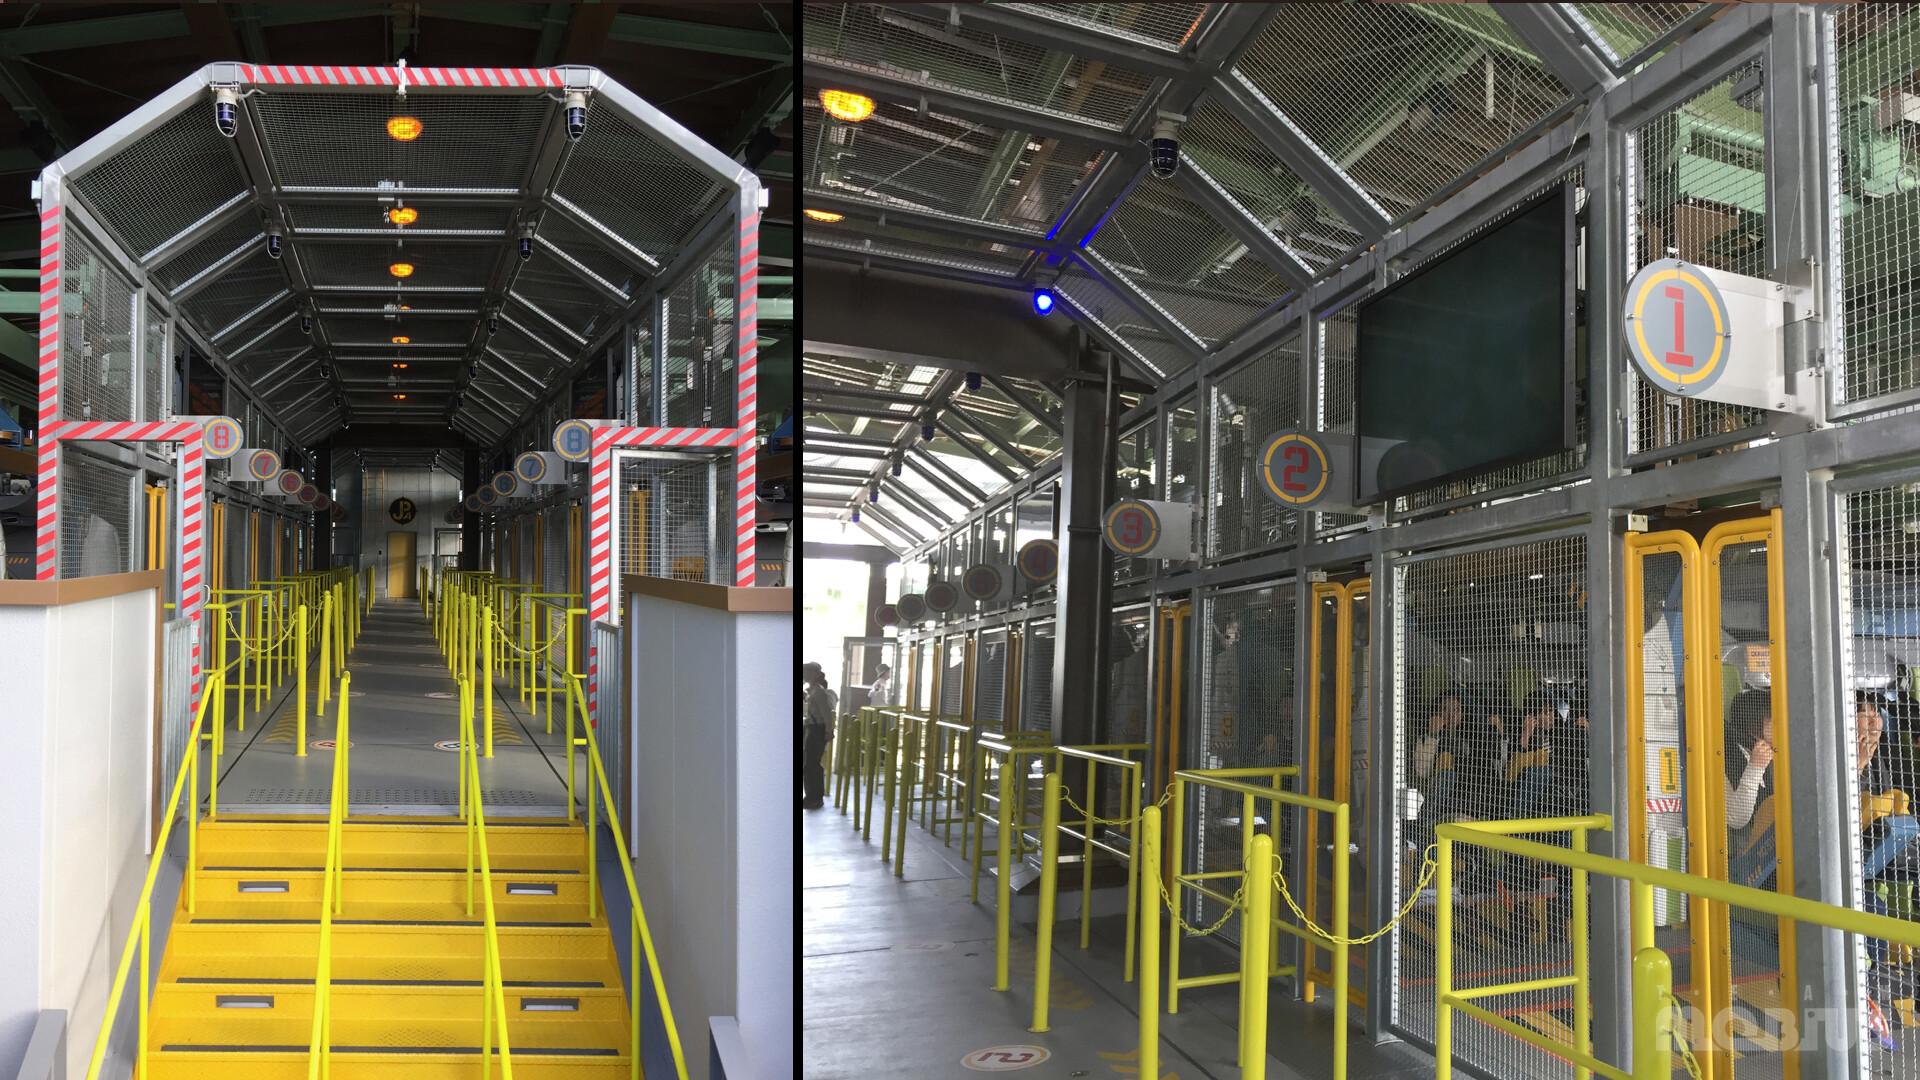 Production Photo of Load Station platform